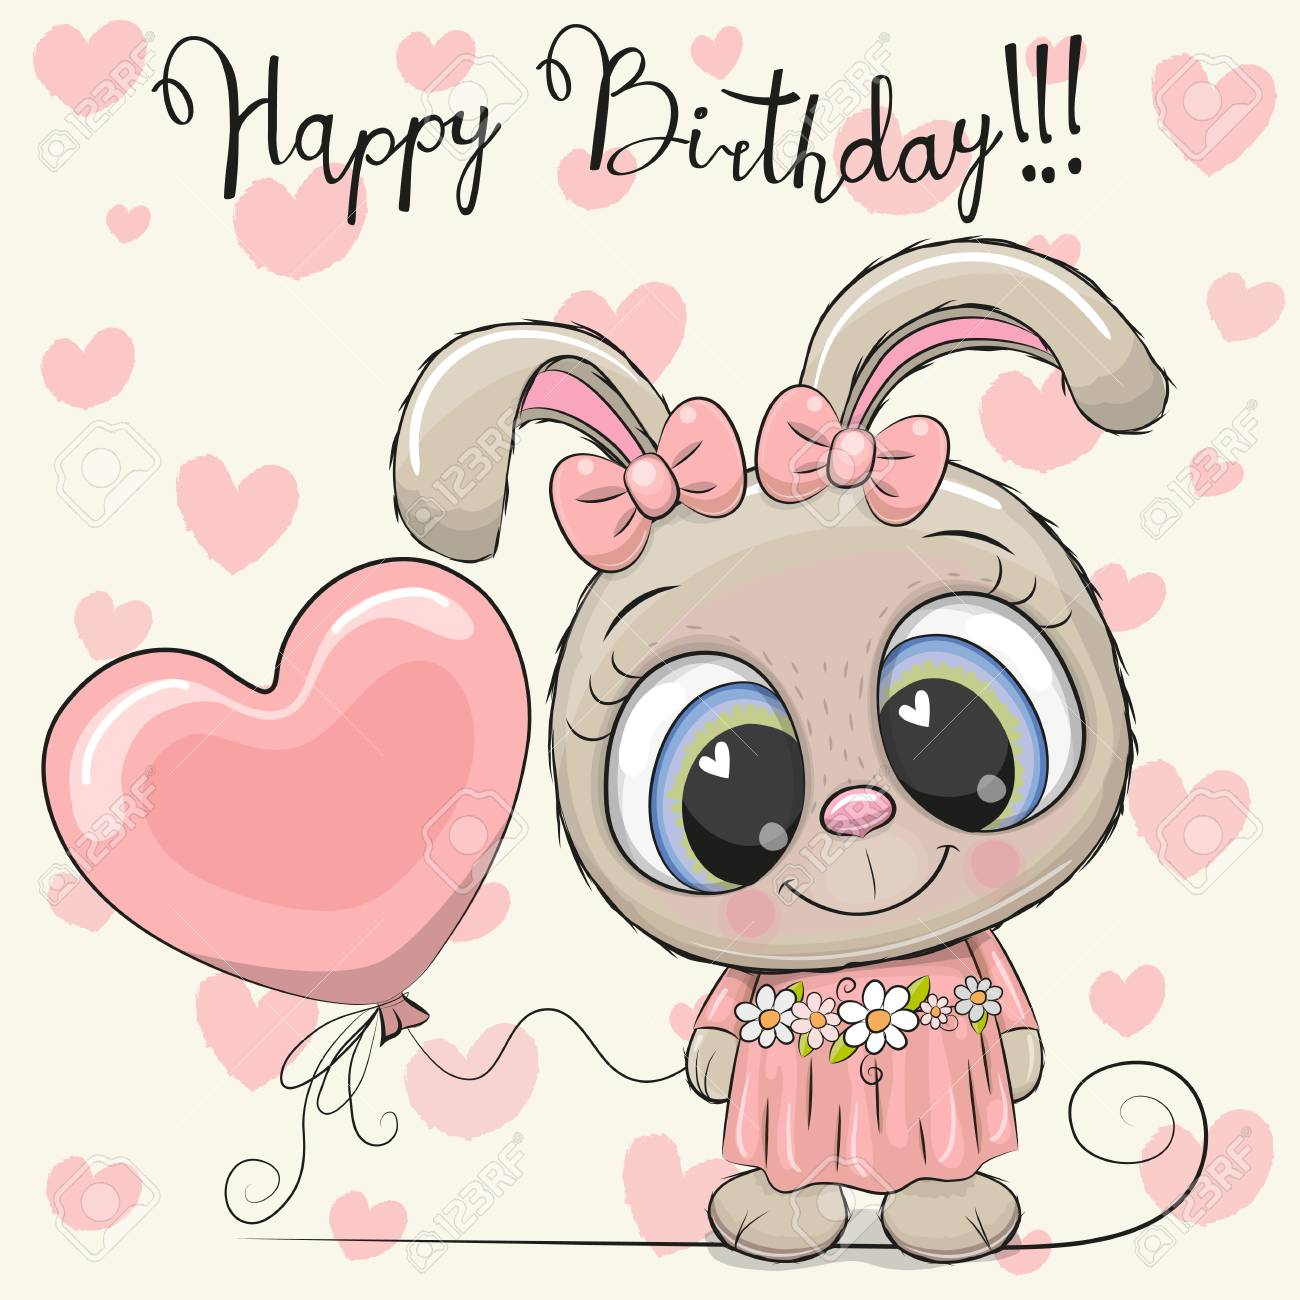 Groovy Greeting Birthday Card Cute Cartoon Rabbit Girl With A Balloon Funny Birthday Cards Online Ioscodamsfinfo